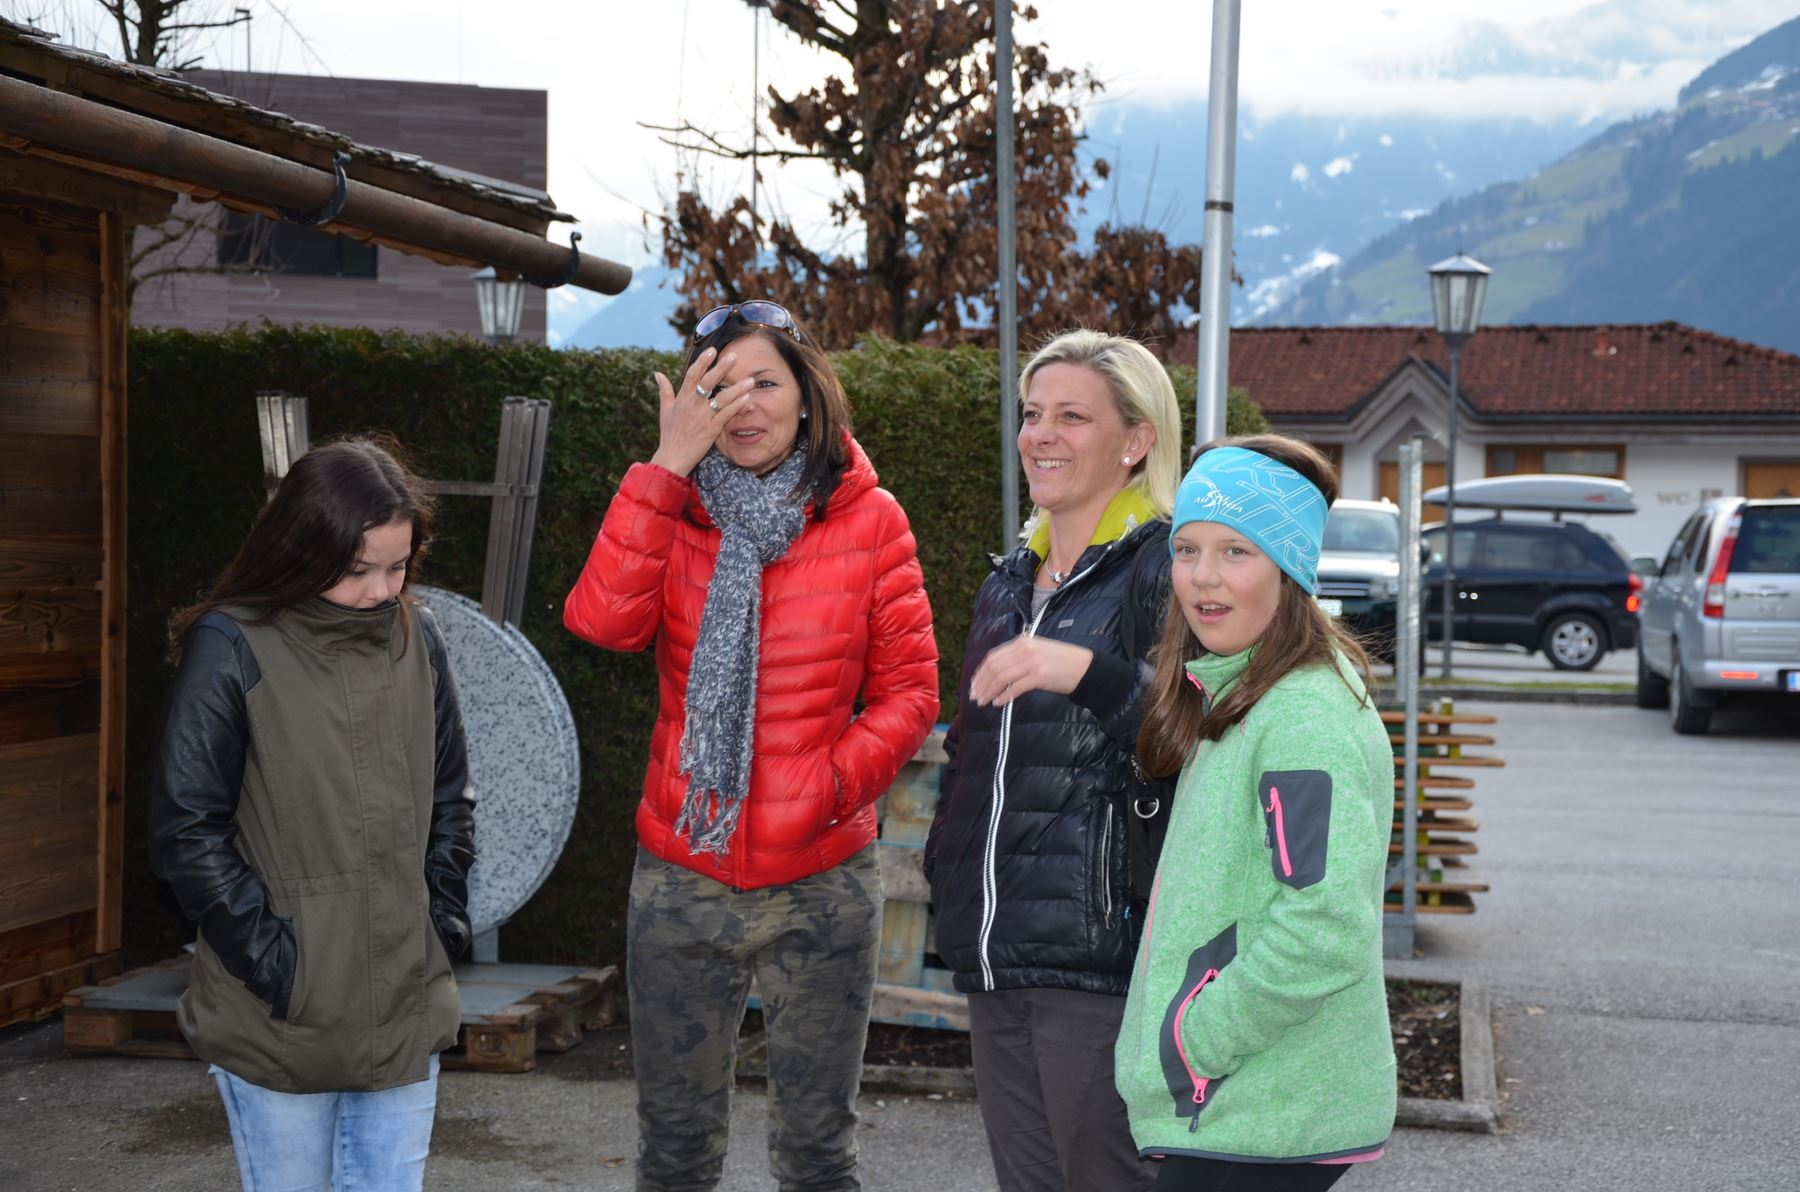 2015-03-22 BV Zillertal Skirennen 351.JPG